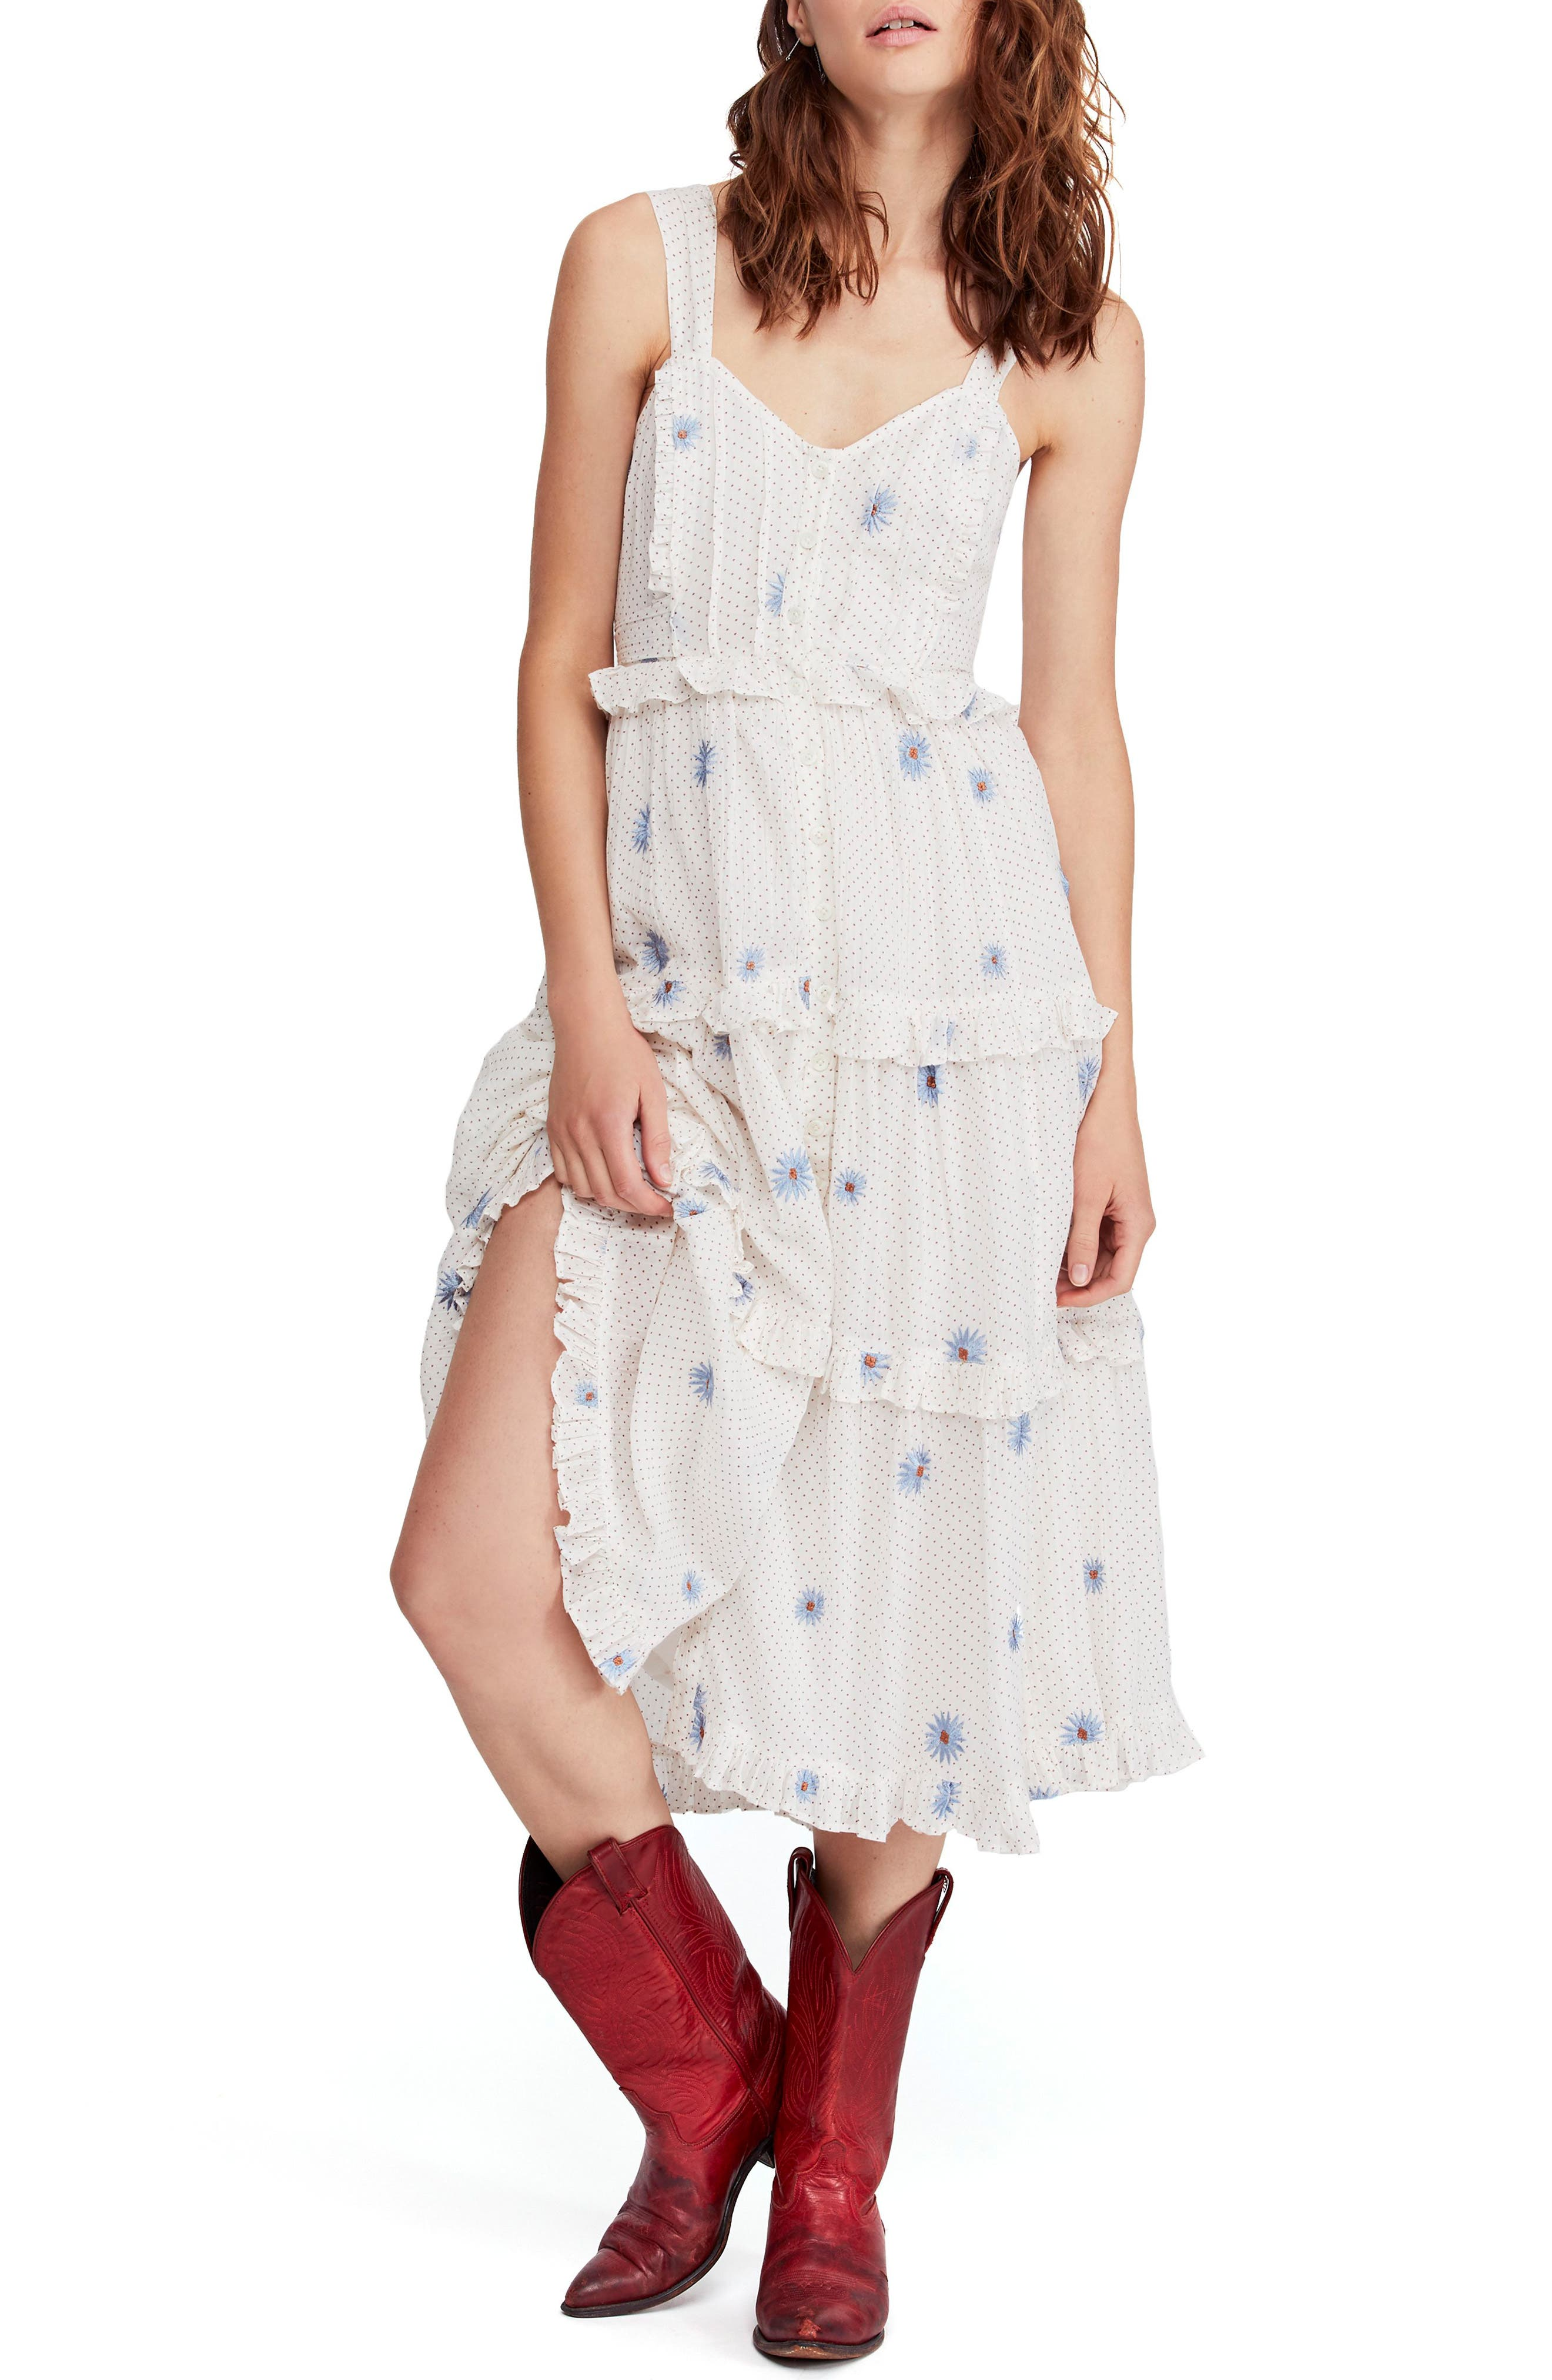 Free People Daisy Chain Midi Dress, Ivory